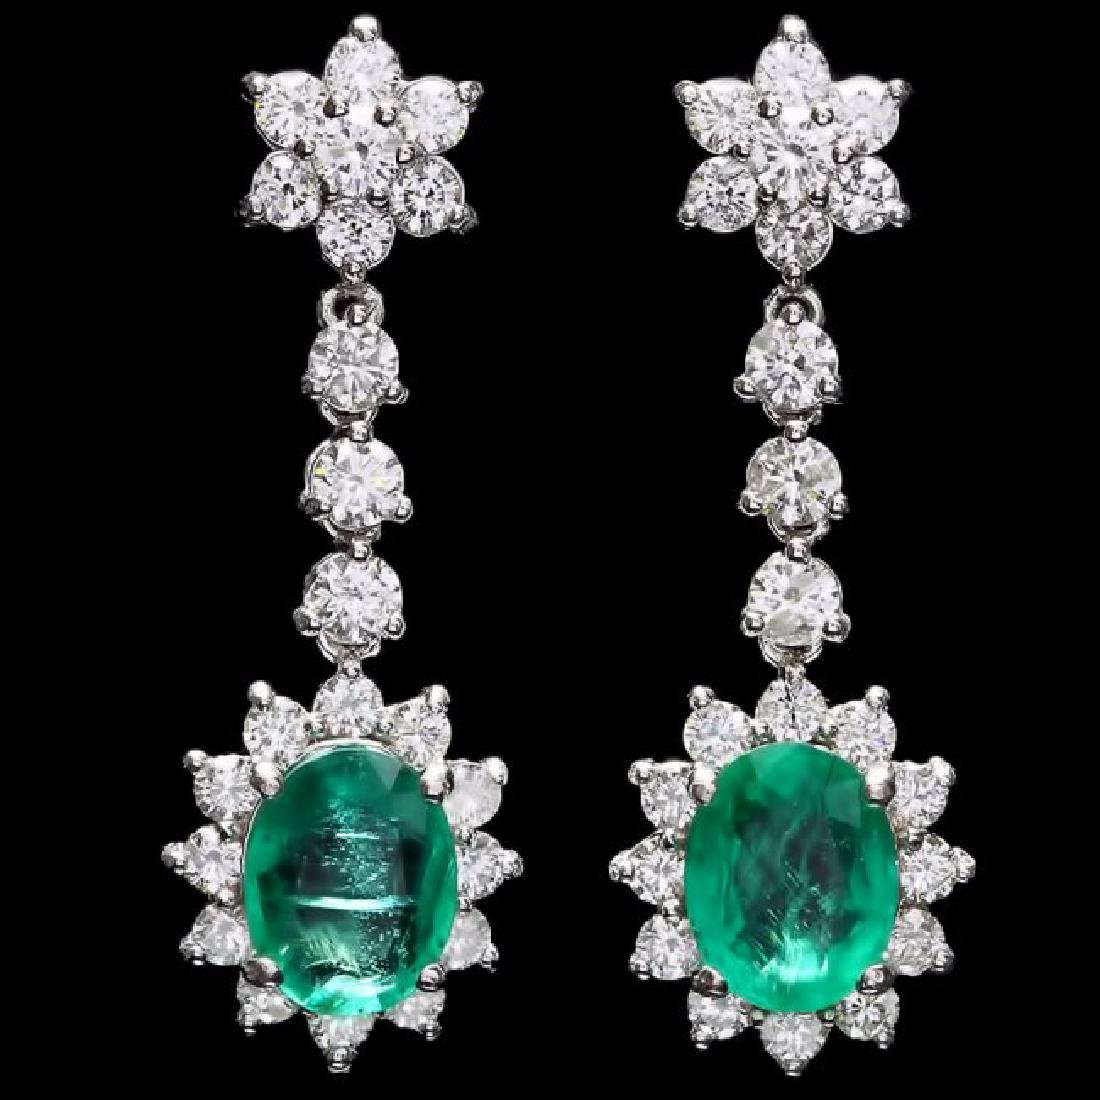 14k W Gold 3.50ct Emerald 2.50ct Diamond Earrings - 3